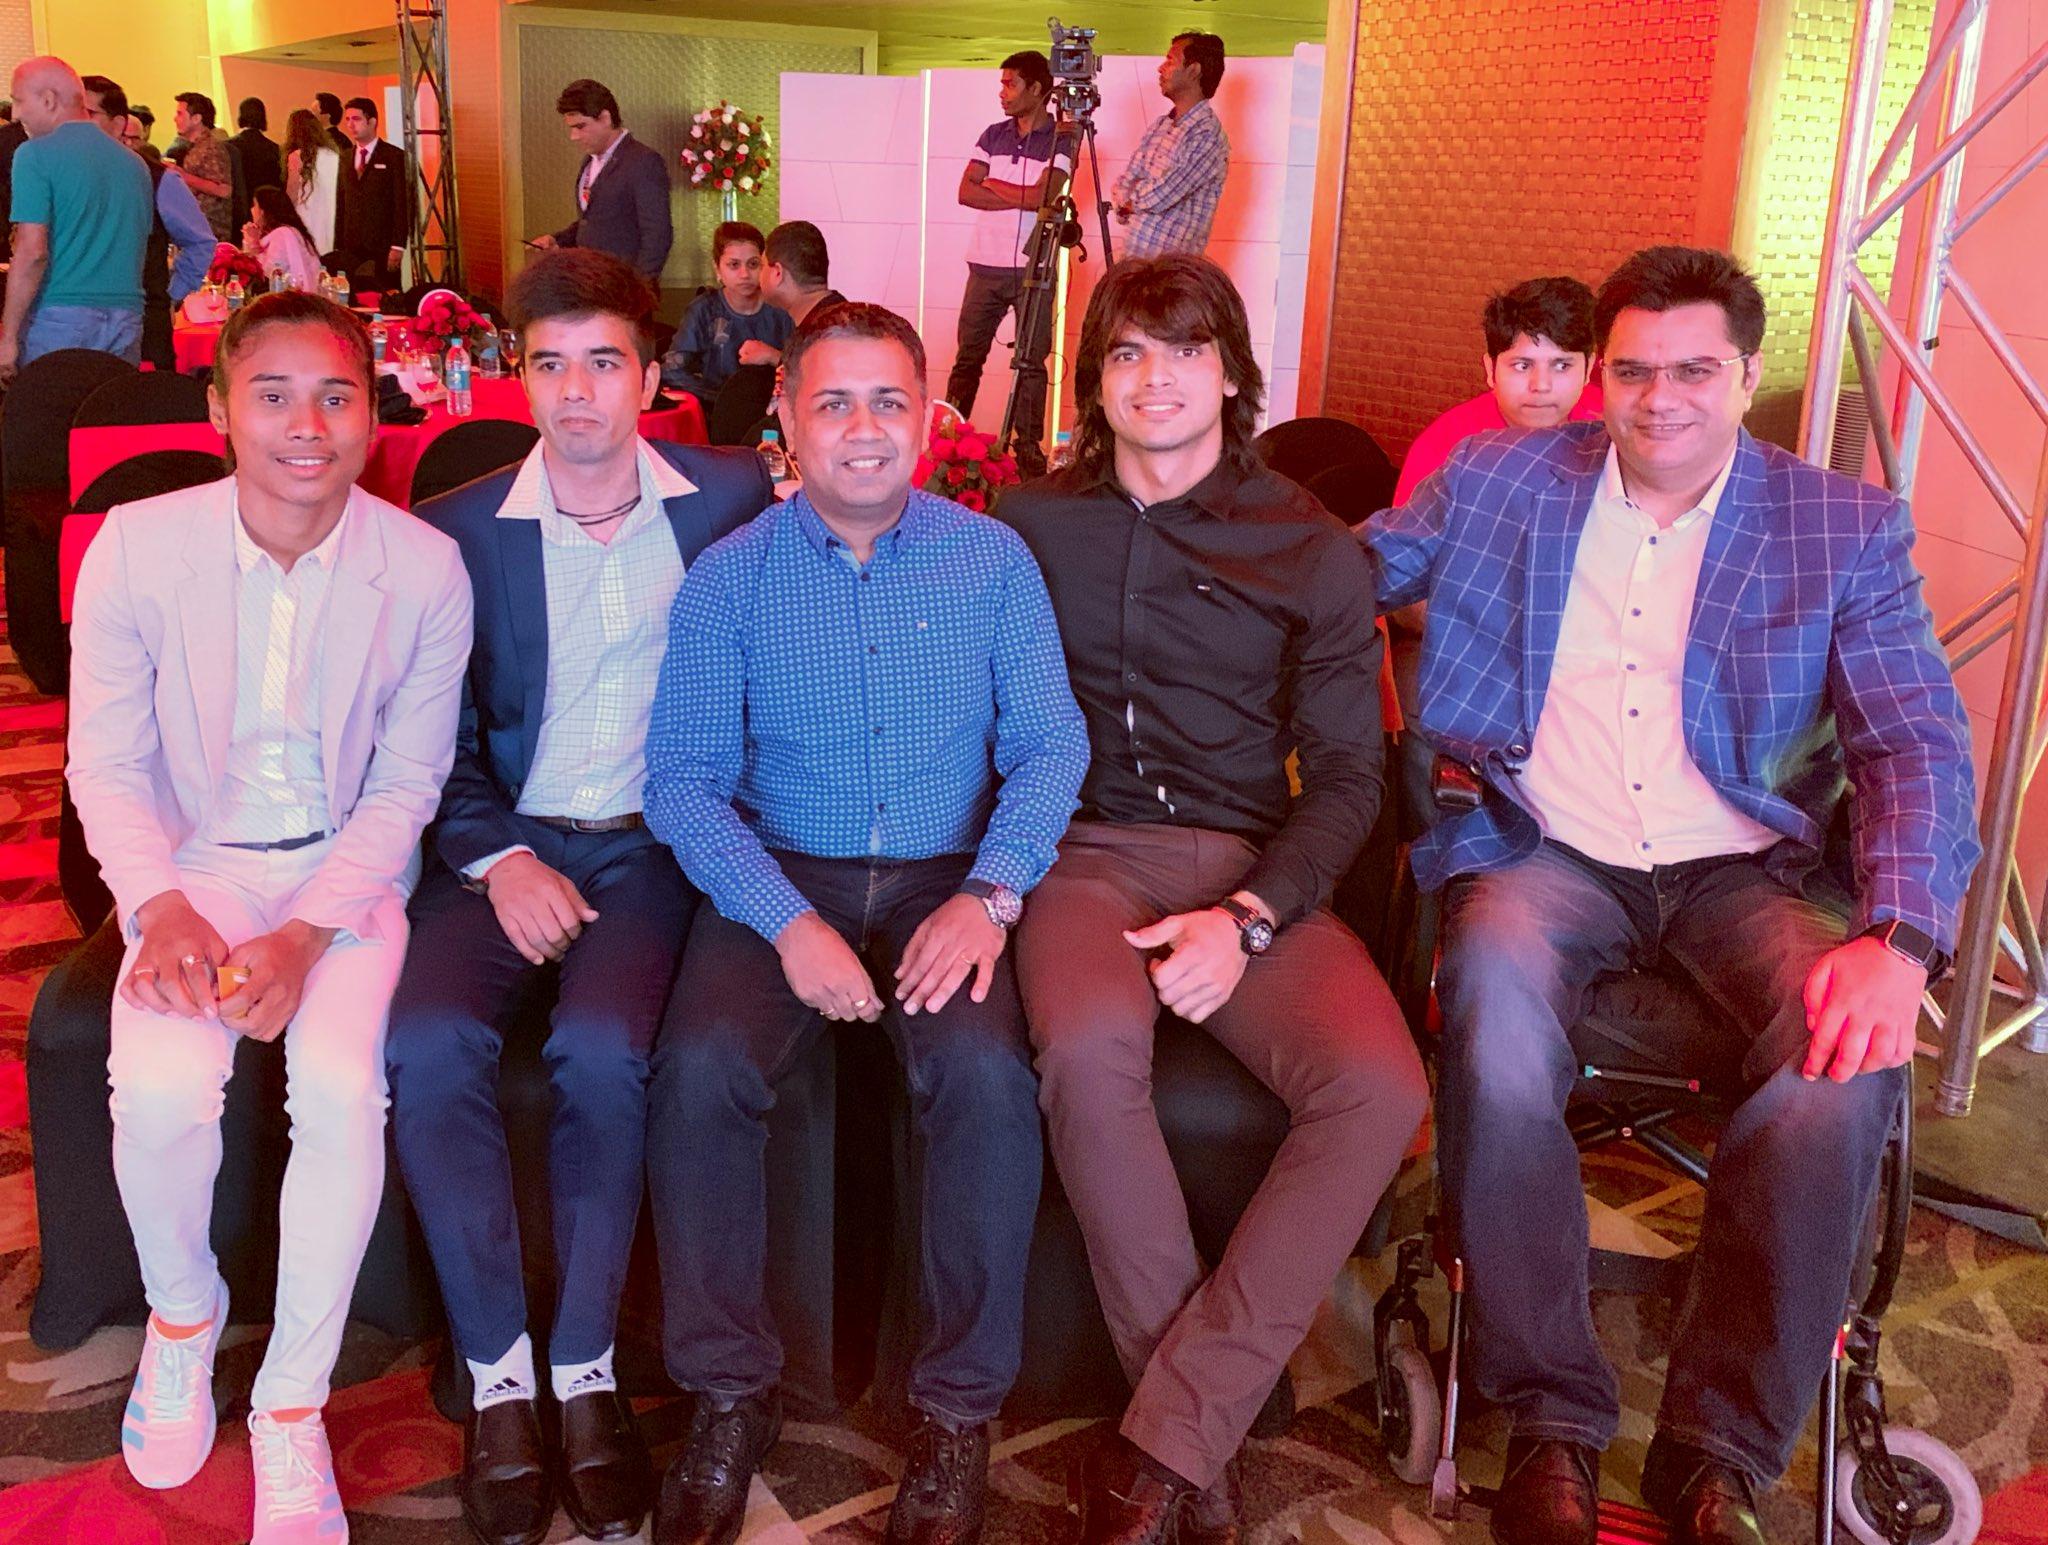 ImageRahul Trehan with Hima Das, Neeraj Chopra, Amit Saroha and Manish Singh Rawat